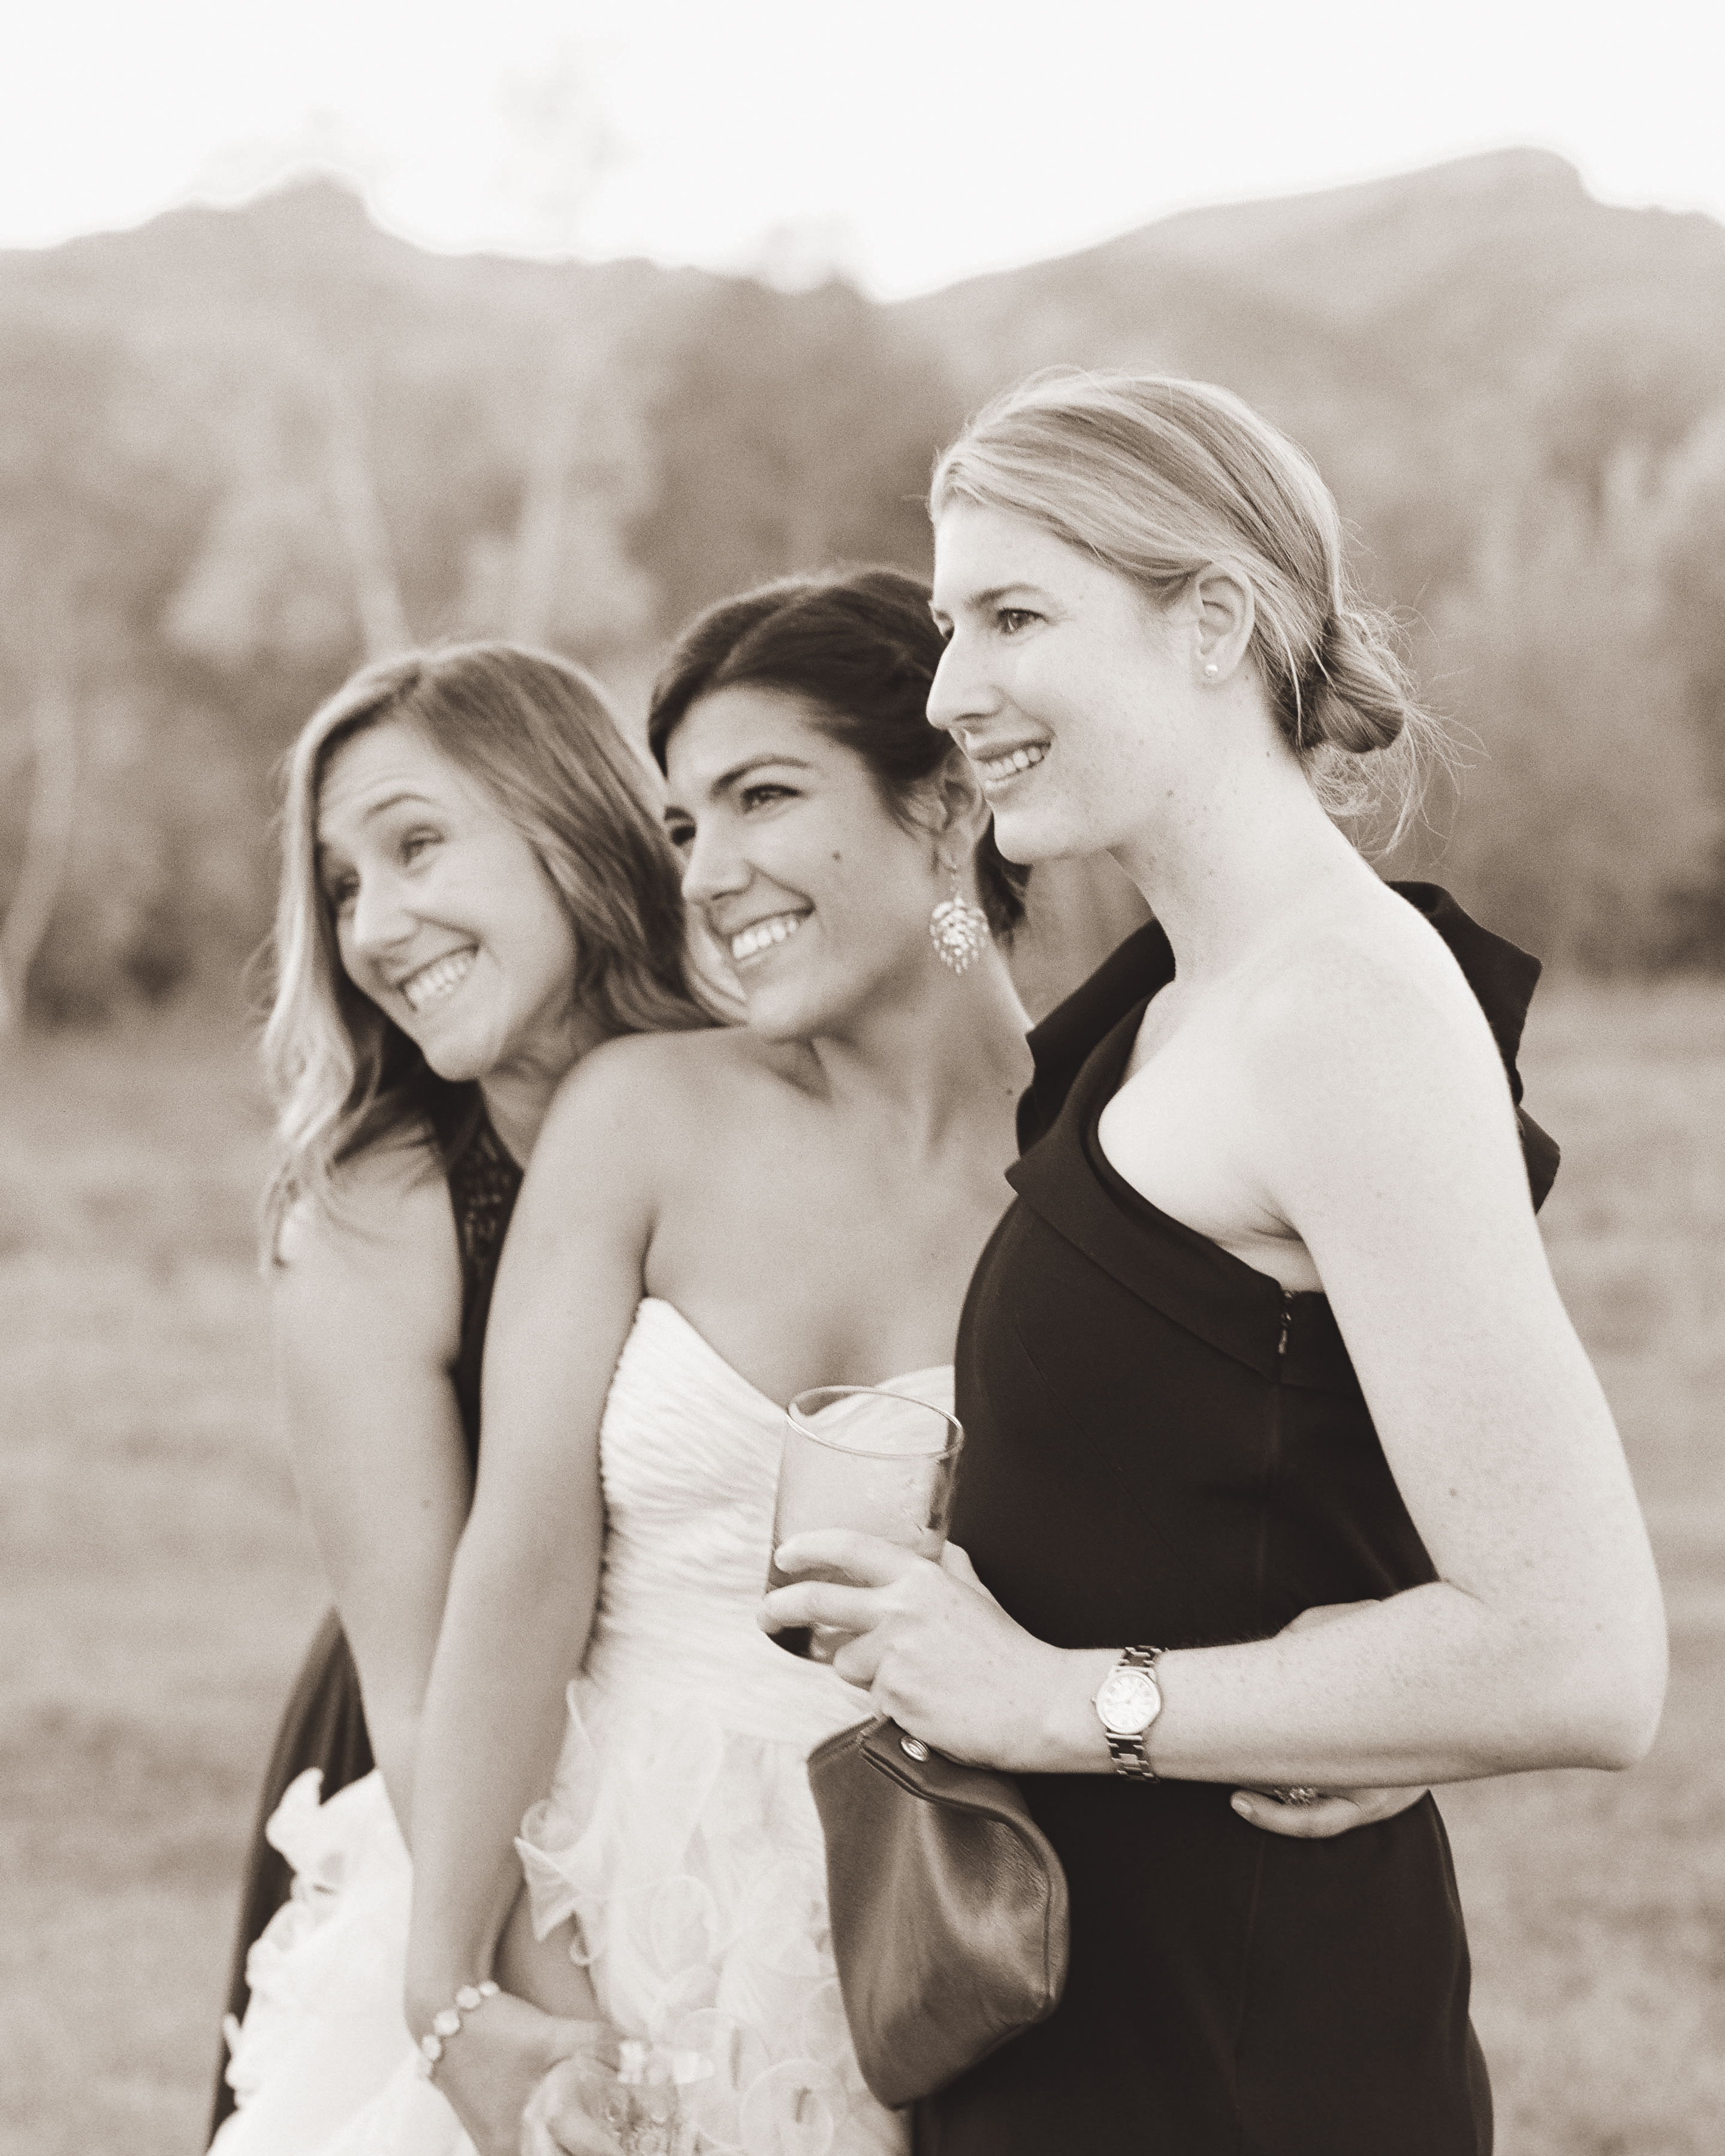 ali-andrew-wedding-wyoming-215-s111942-bw.jpg